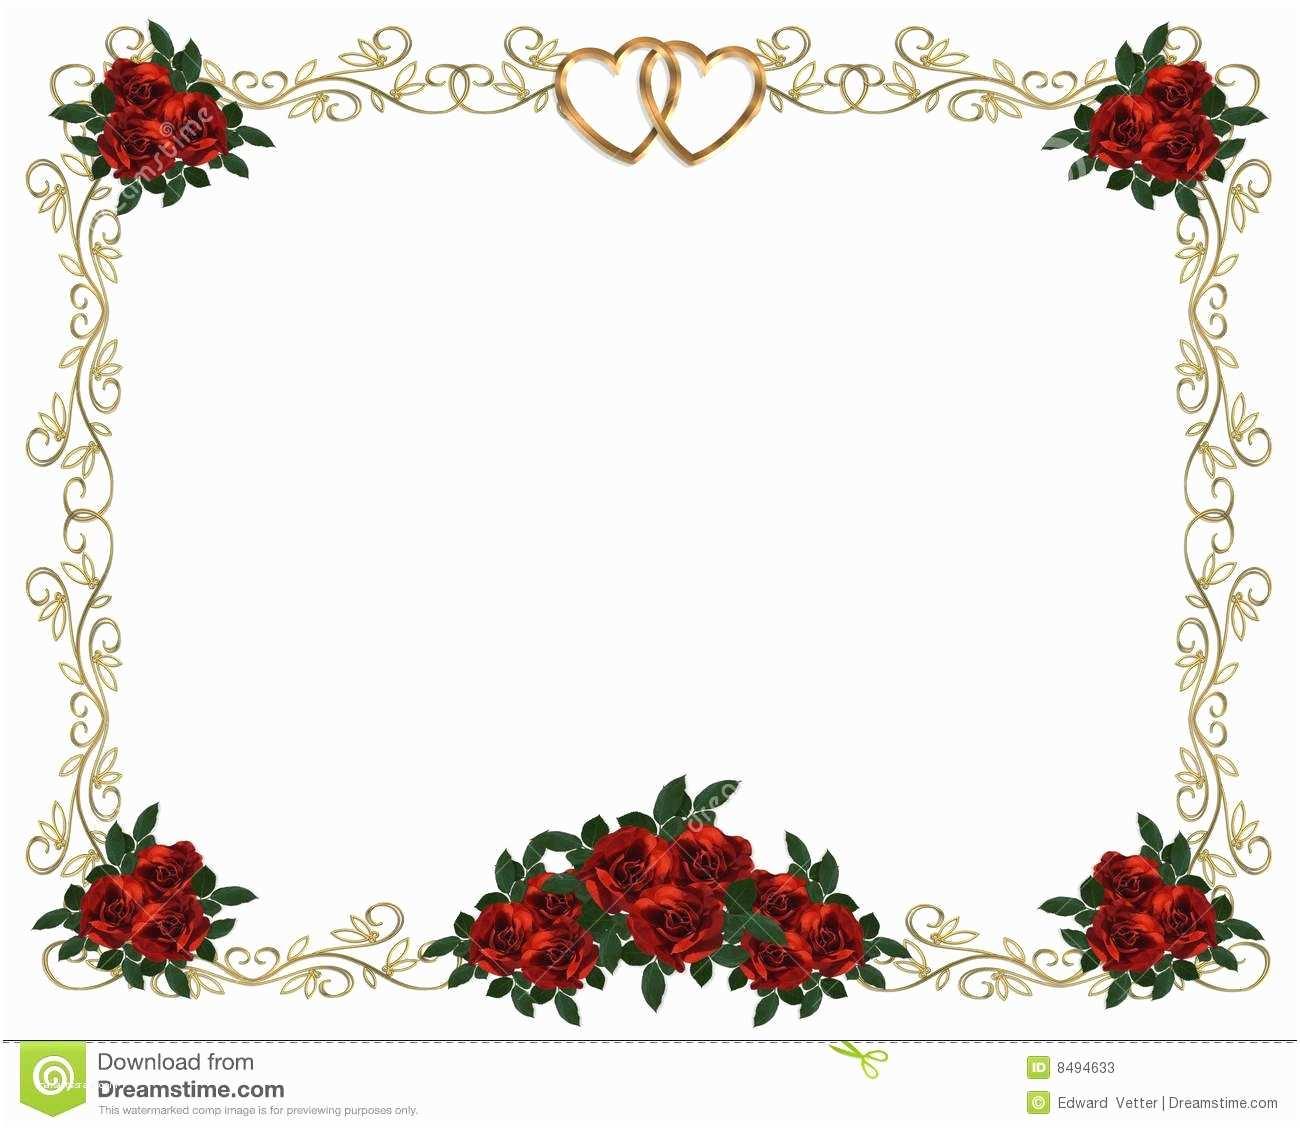 Wedding Invitation Borders Red Roses Border Wedding Invitation Stock S Image